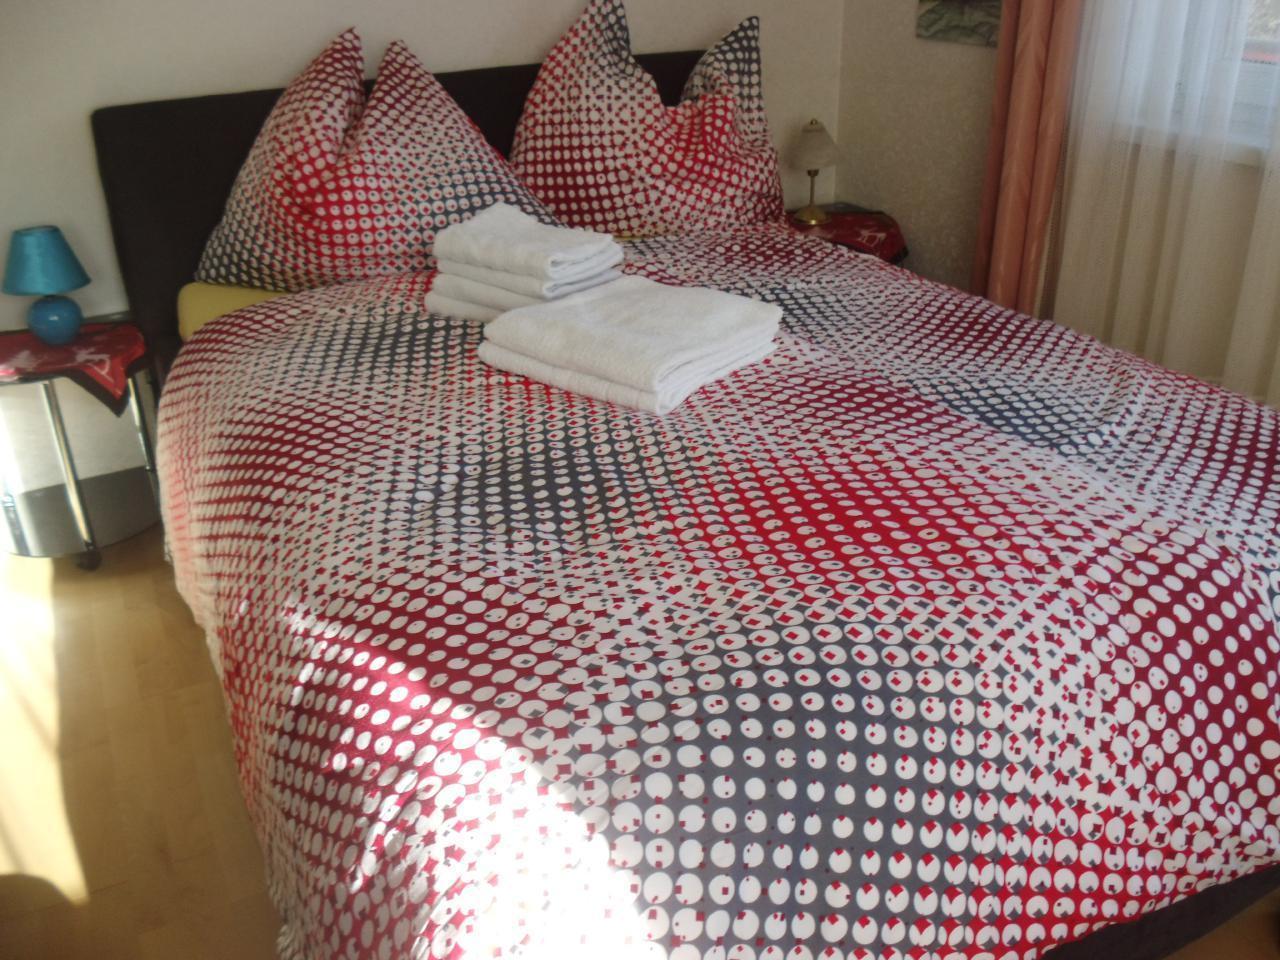 Appartement de vacances Appartement Draublick (500286), Neuhaus (Klopeiner See), Lac Klopein, Carinthie, Autriche, image 9